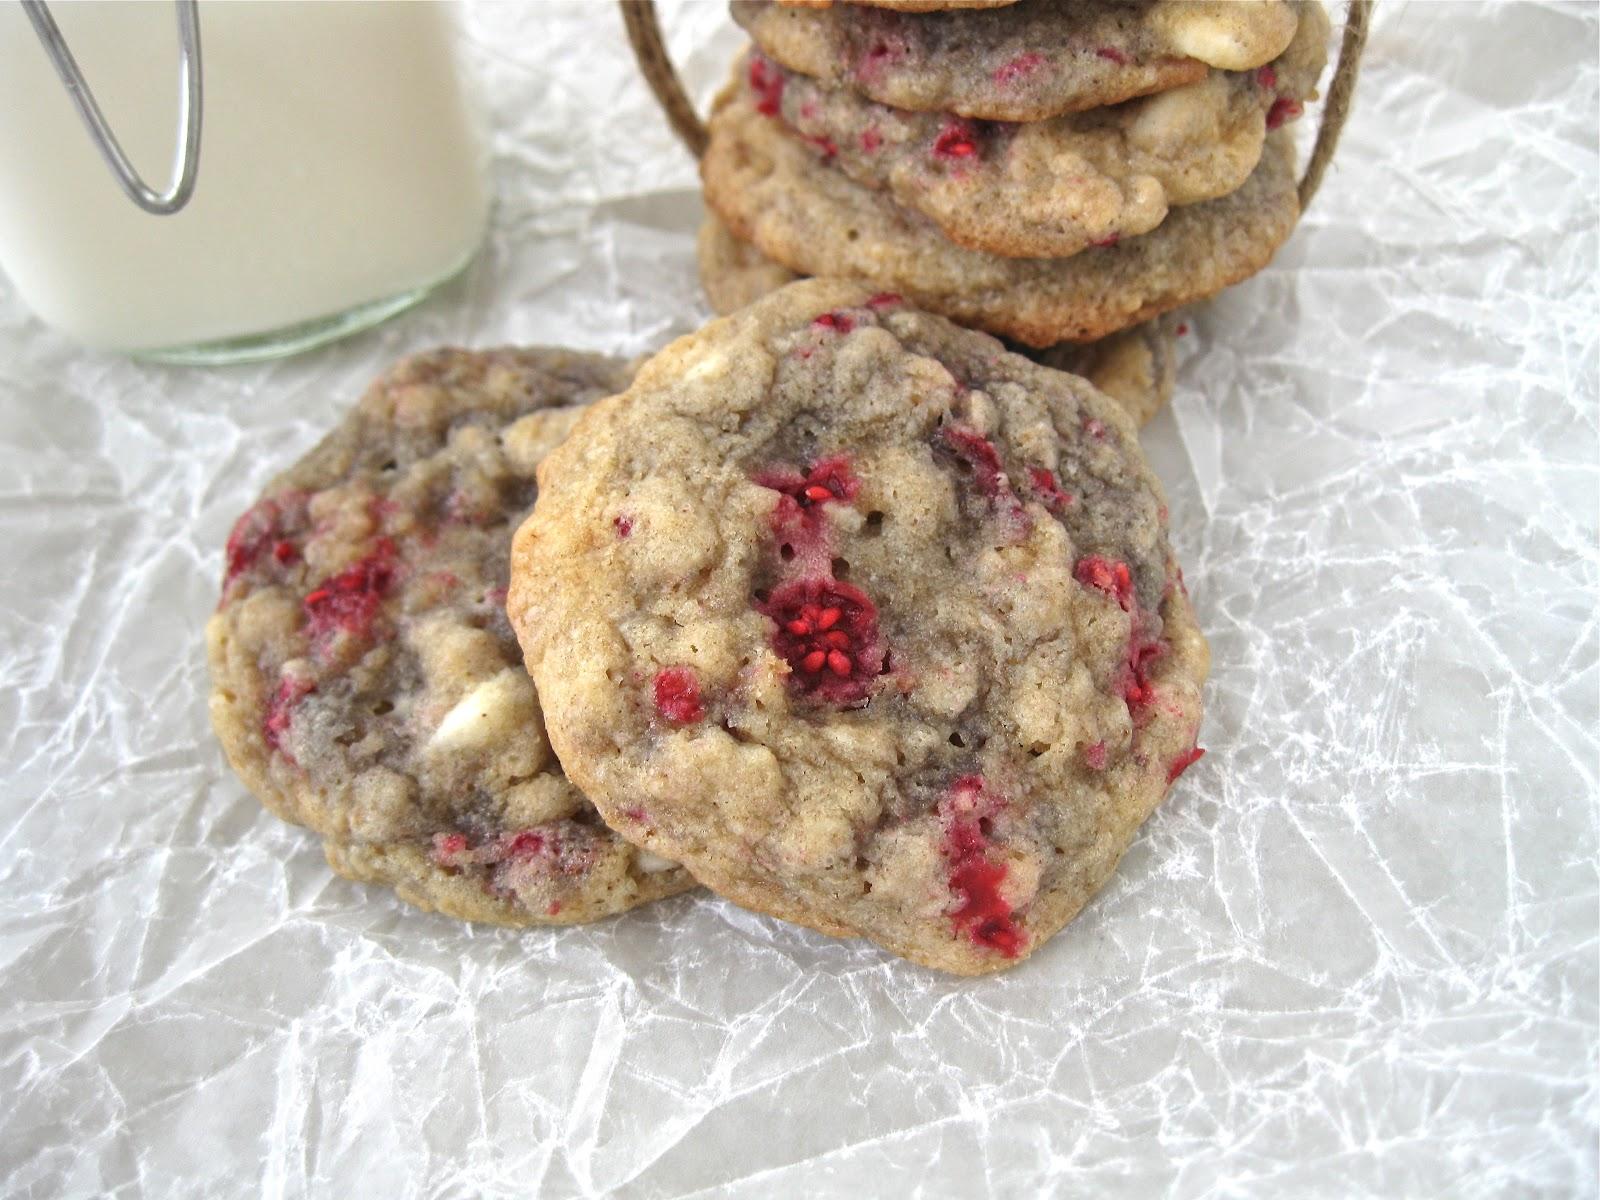 ... , Bake, Sew, Create: White Chocolate Chip Raspberry Oatmeal Cookies